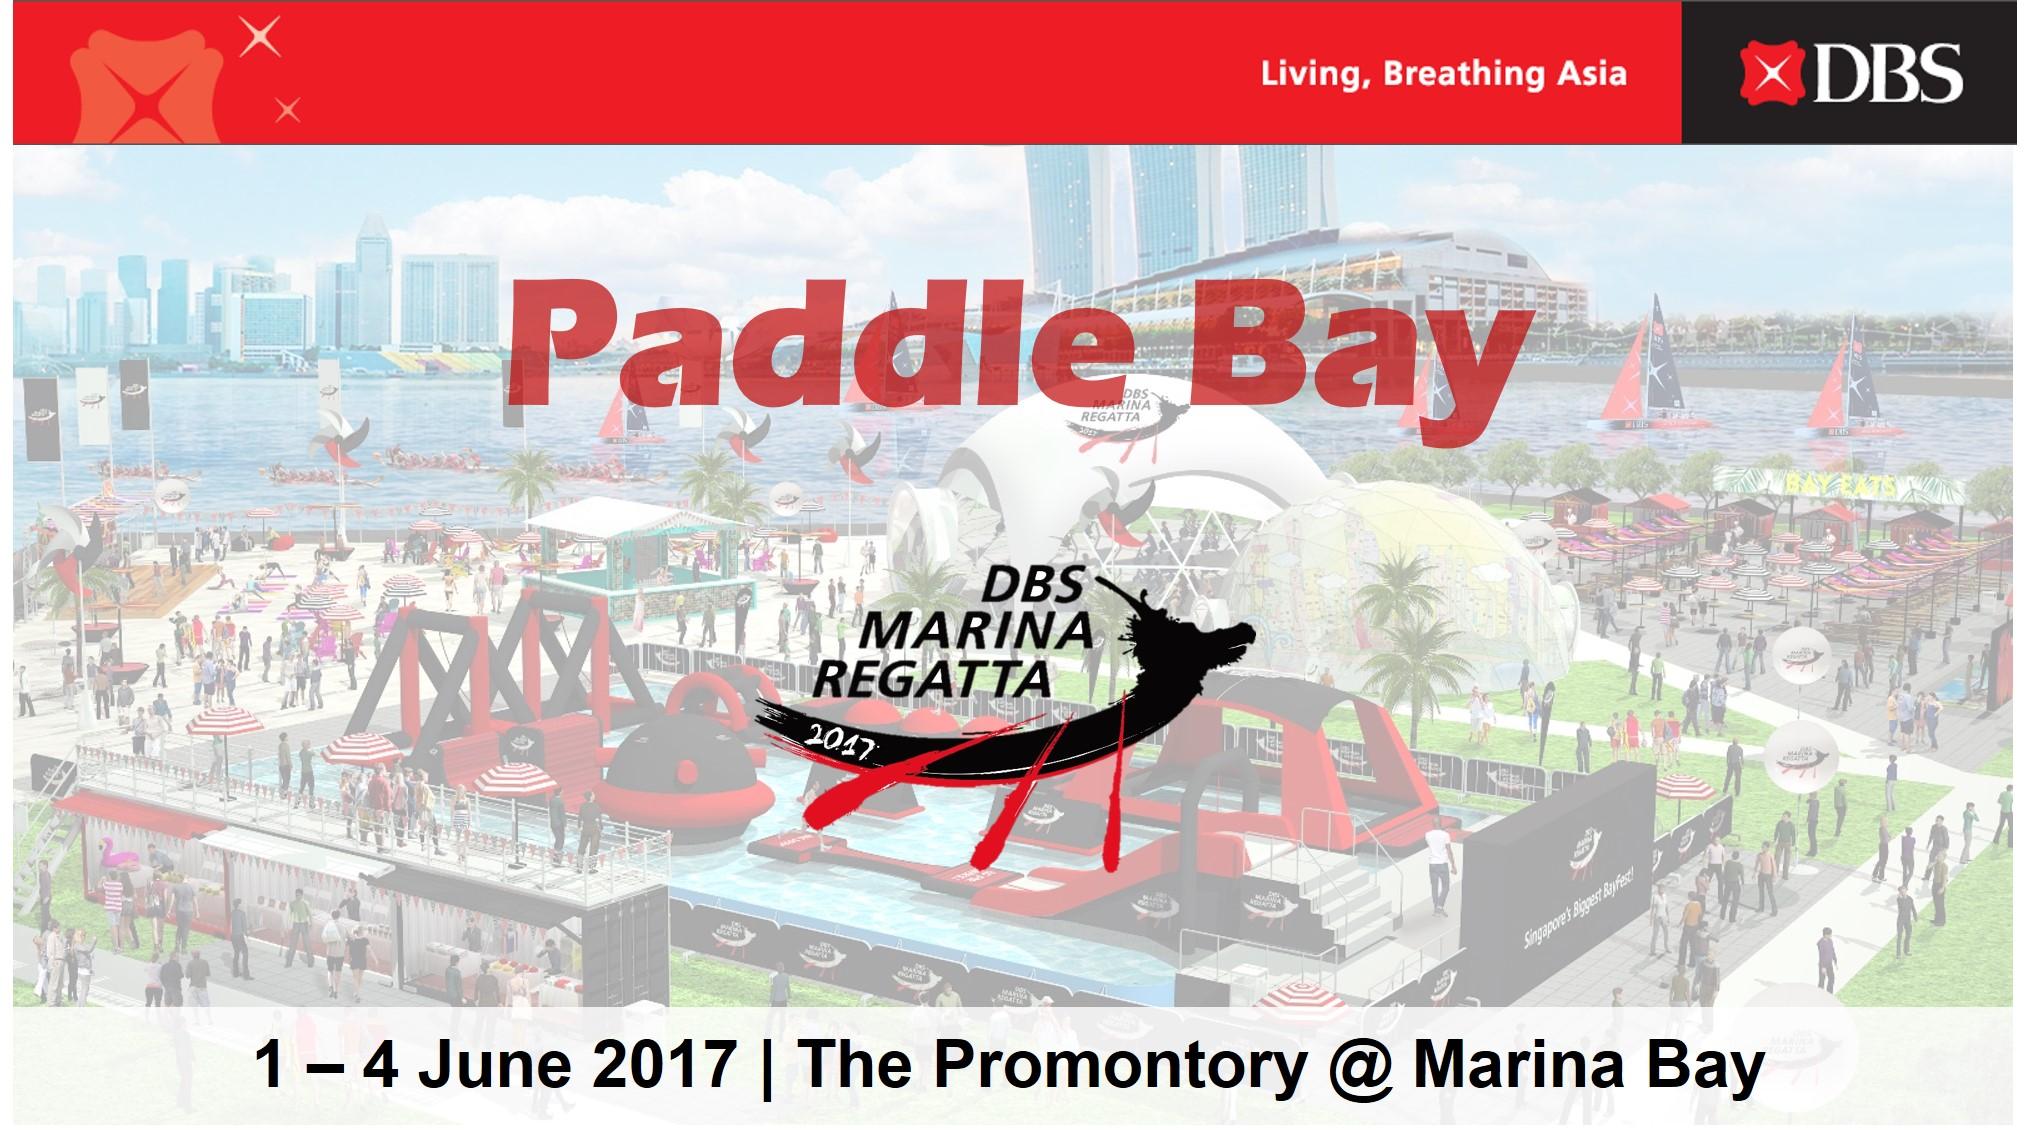 Paddle Bay @ DBS Marina Regatta 2017